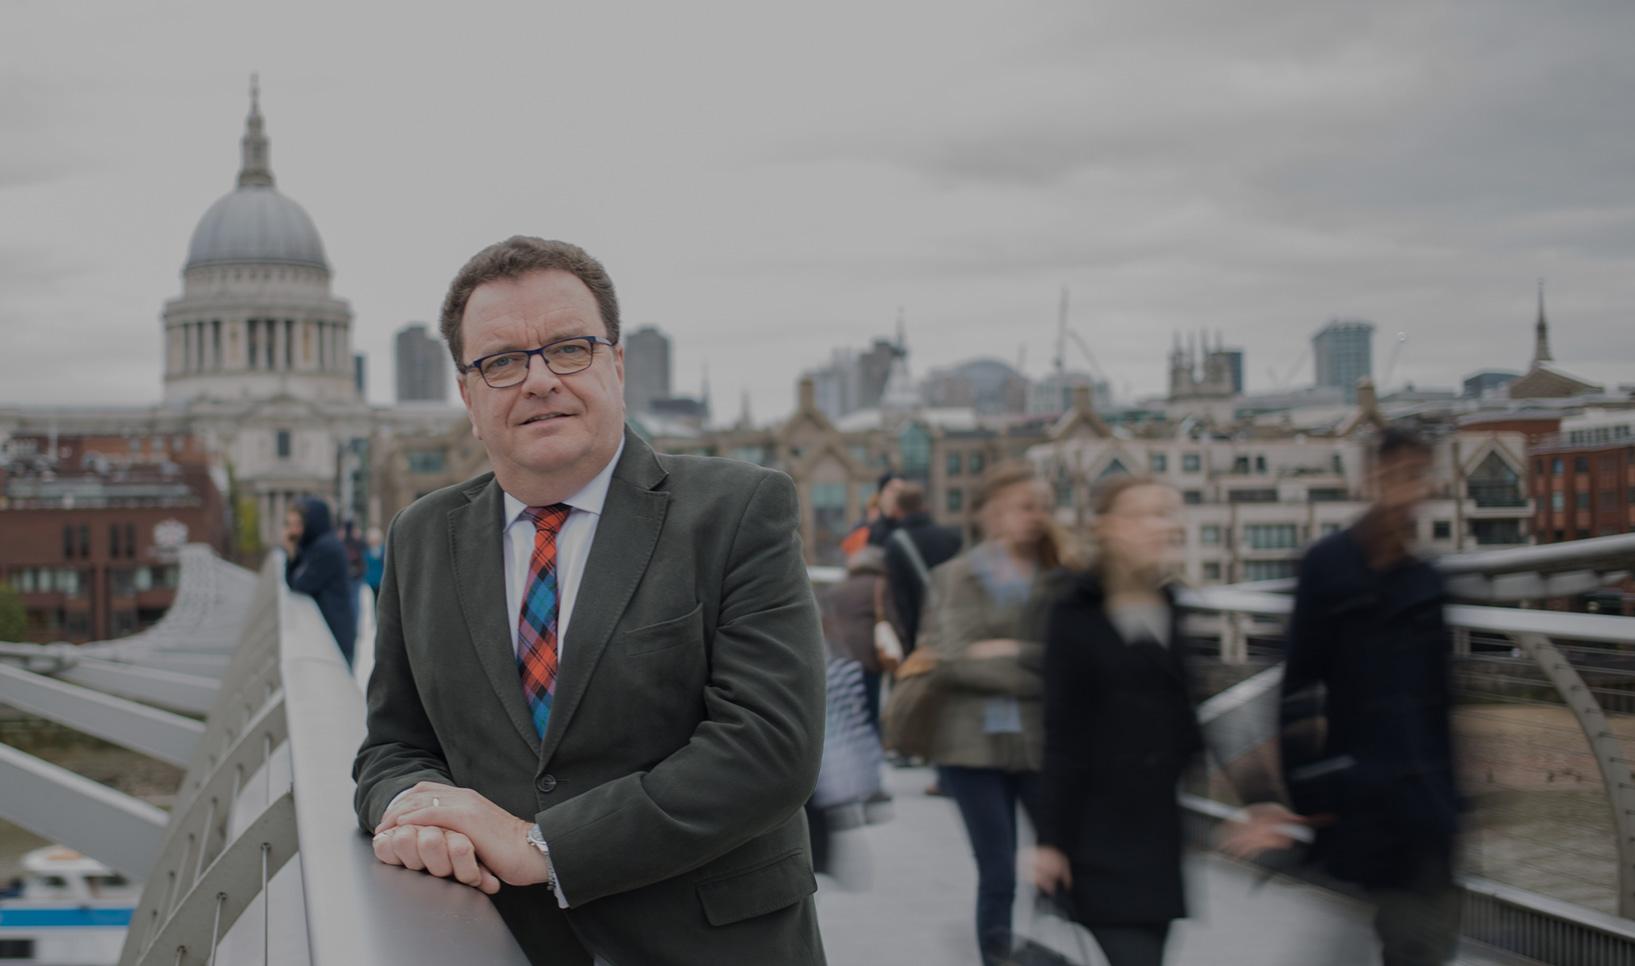 Image from Briscoe French PR website showing Kevin Briscoe on Millennium Bridge, London, UK